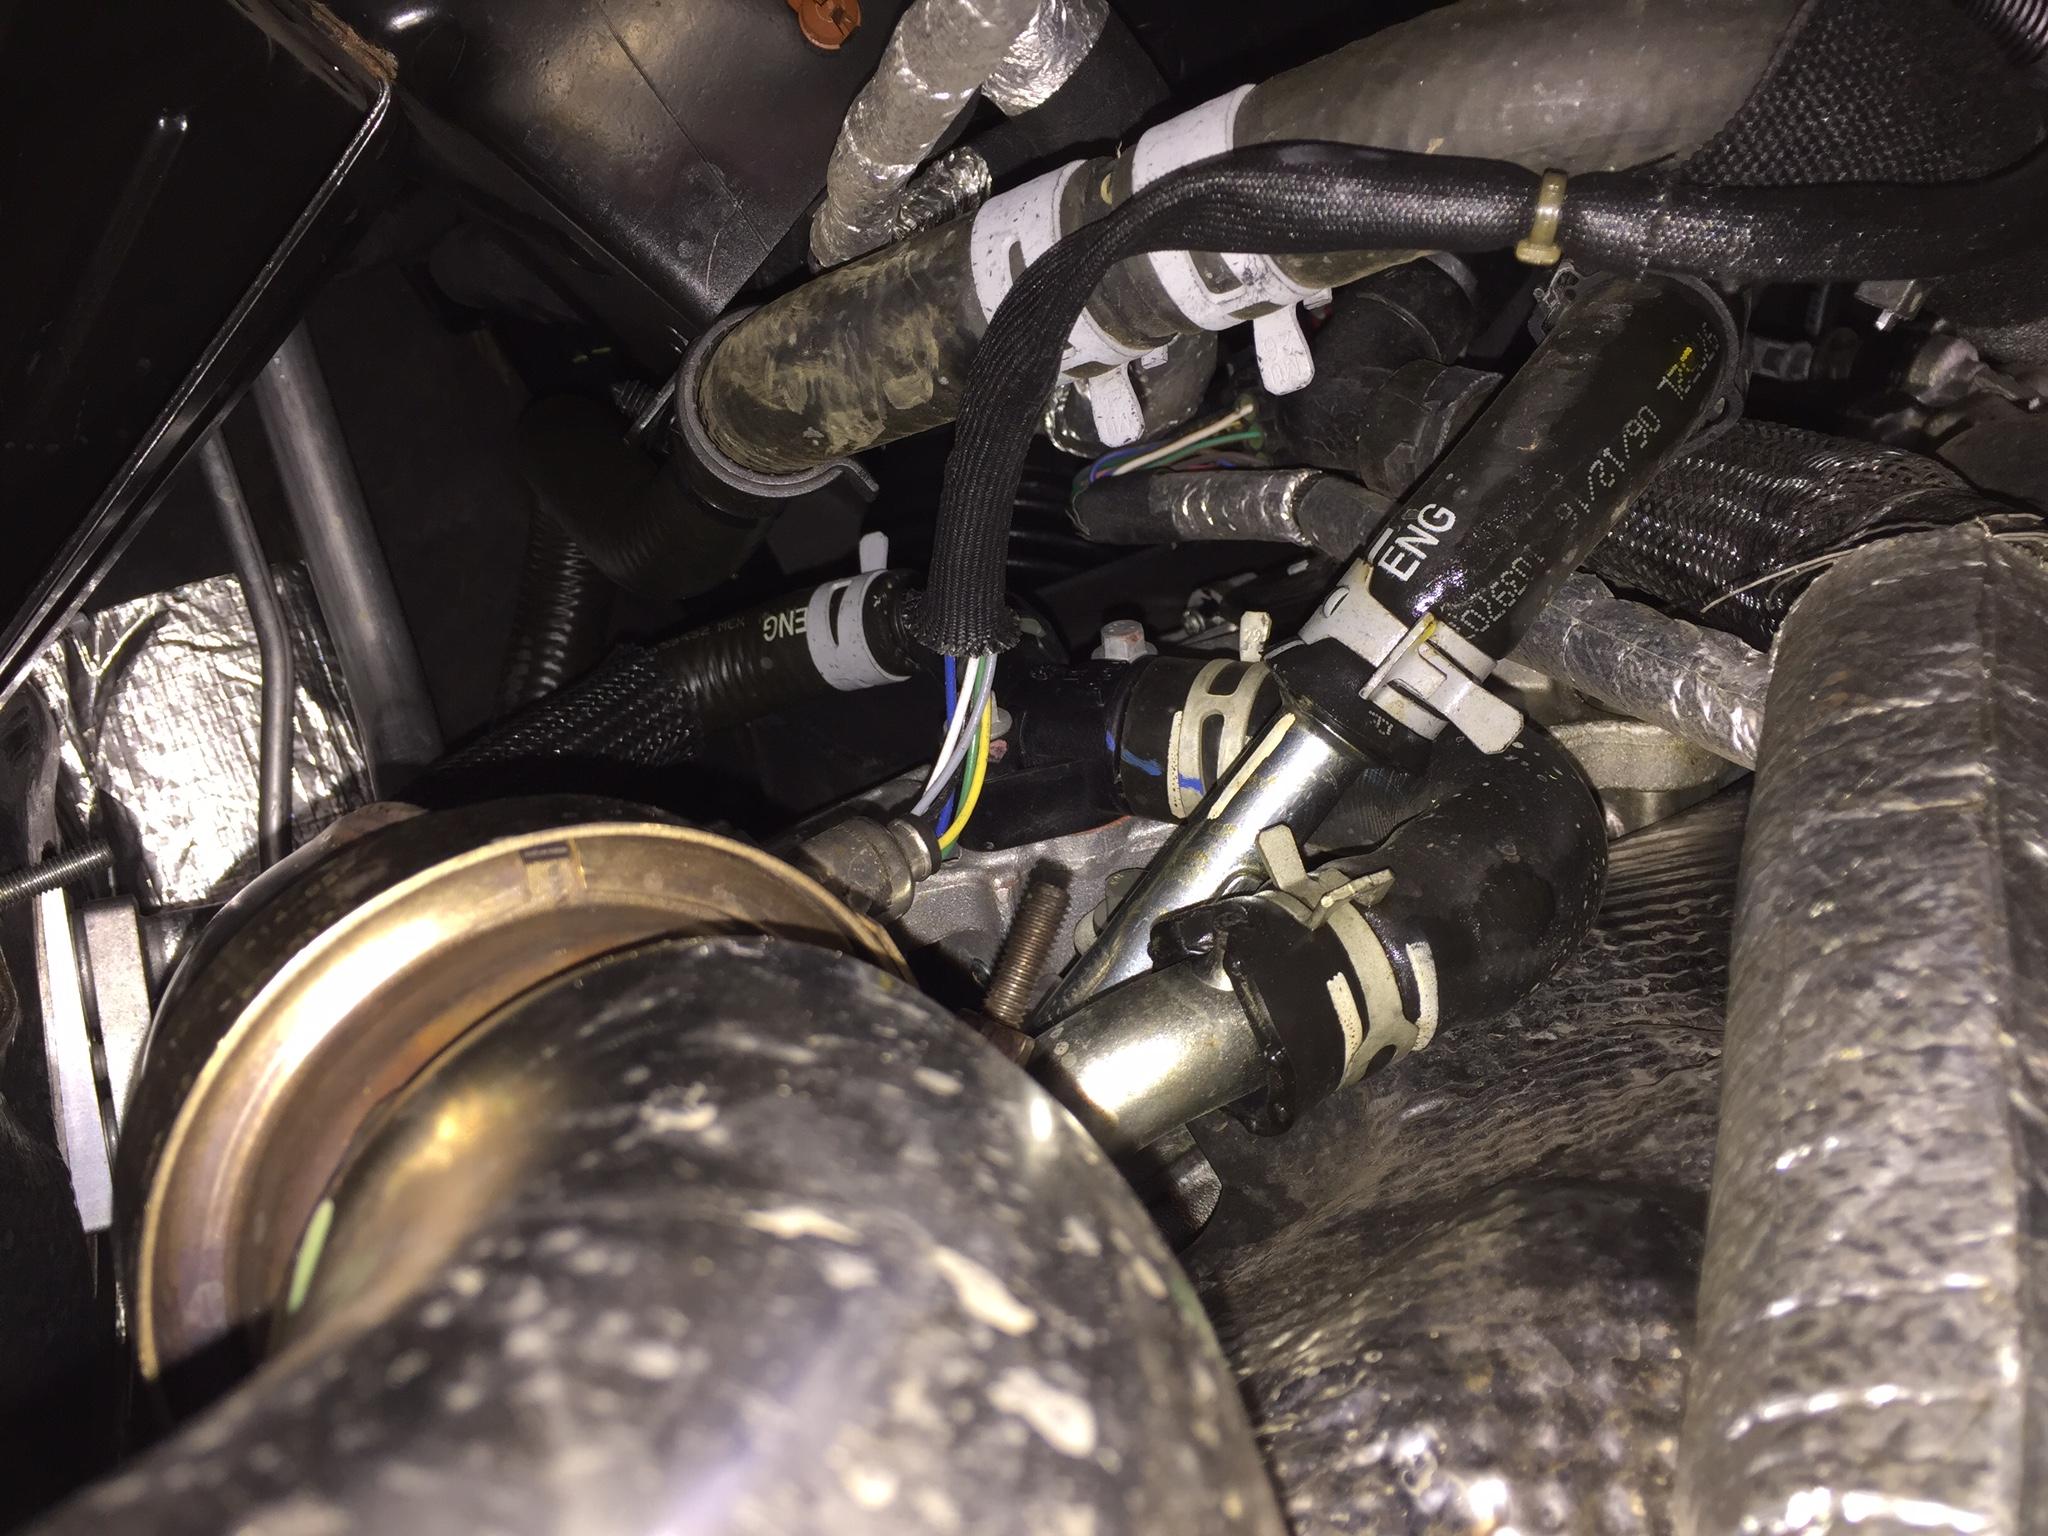 Coincidence Fuel smell, after dealer replaced EGR & DPF?-461550c1-0154-4c5b-b5d6-8d983ba4e8f4_1560408092042.jpeg